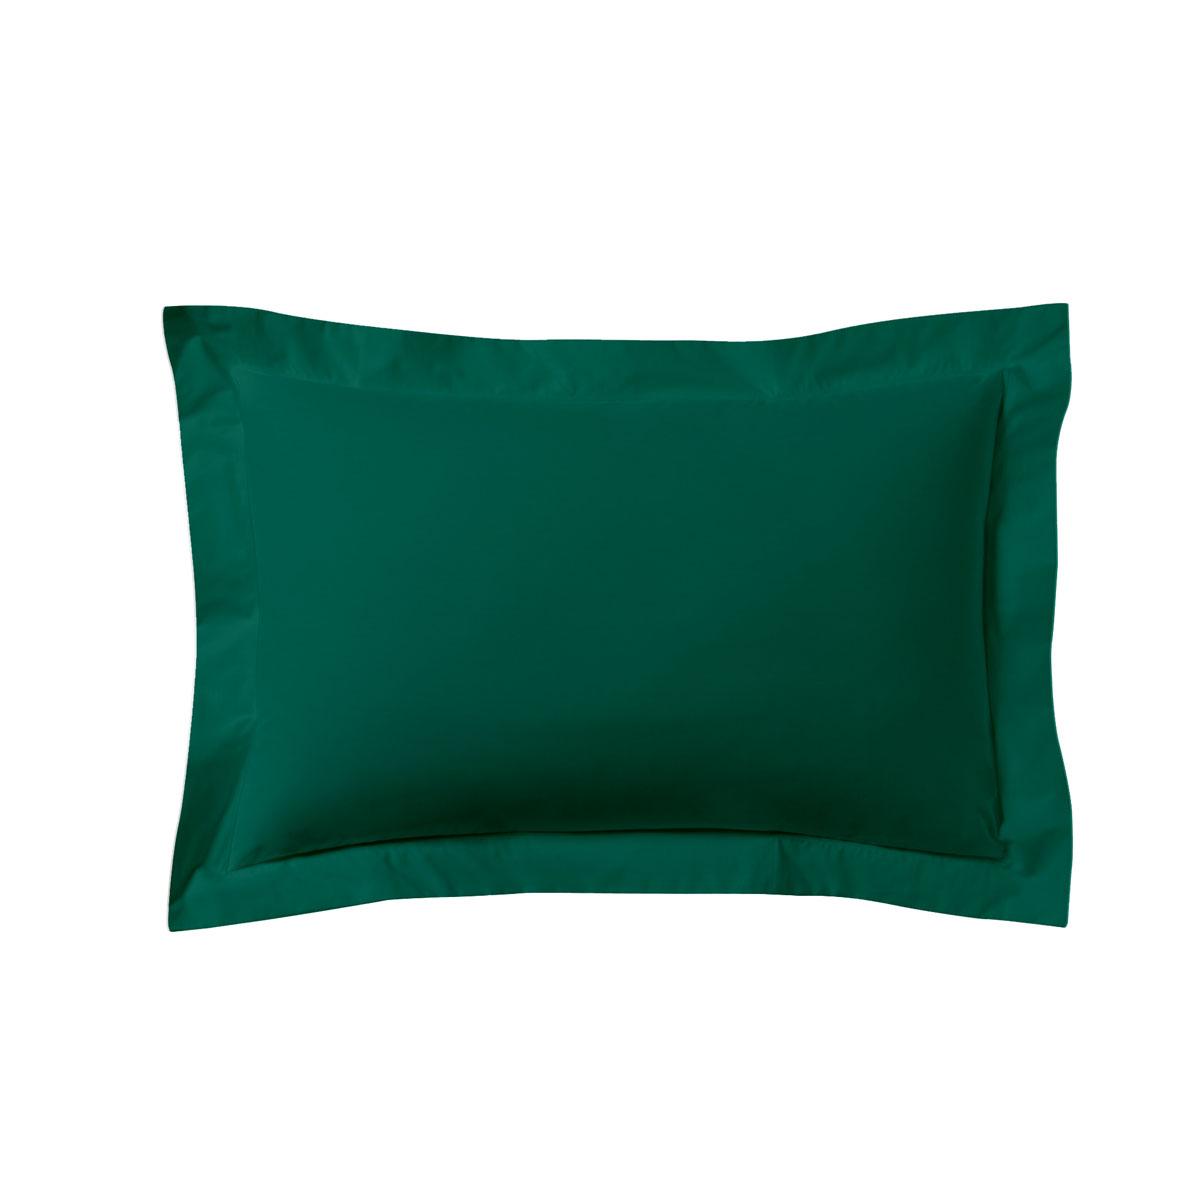 Taie d'oreiller unie en coton vert opale 50x70